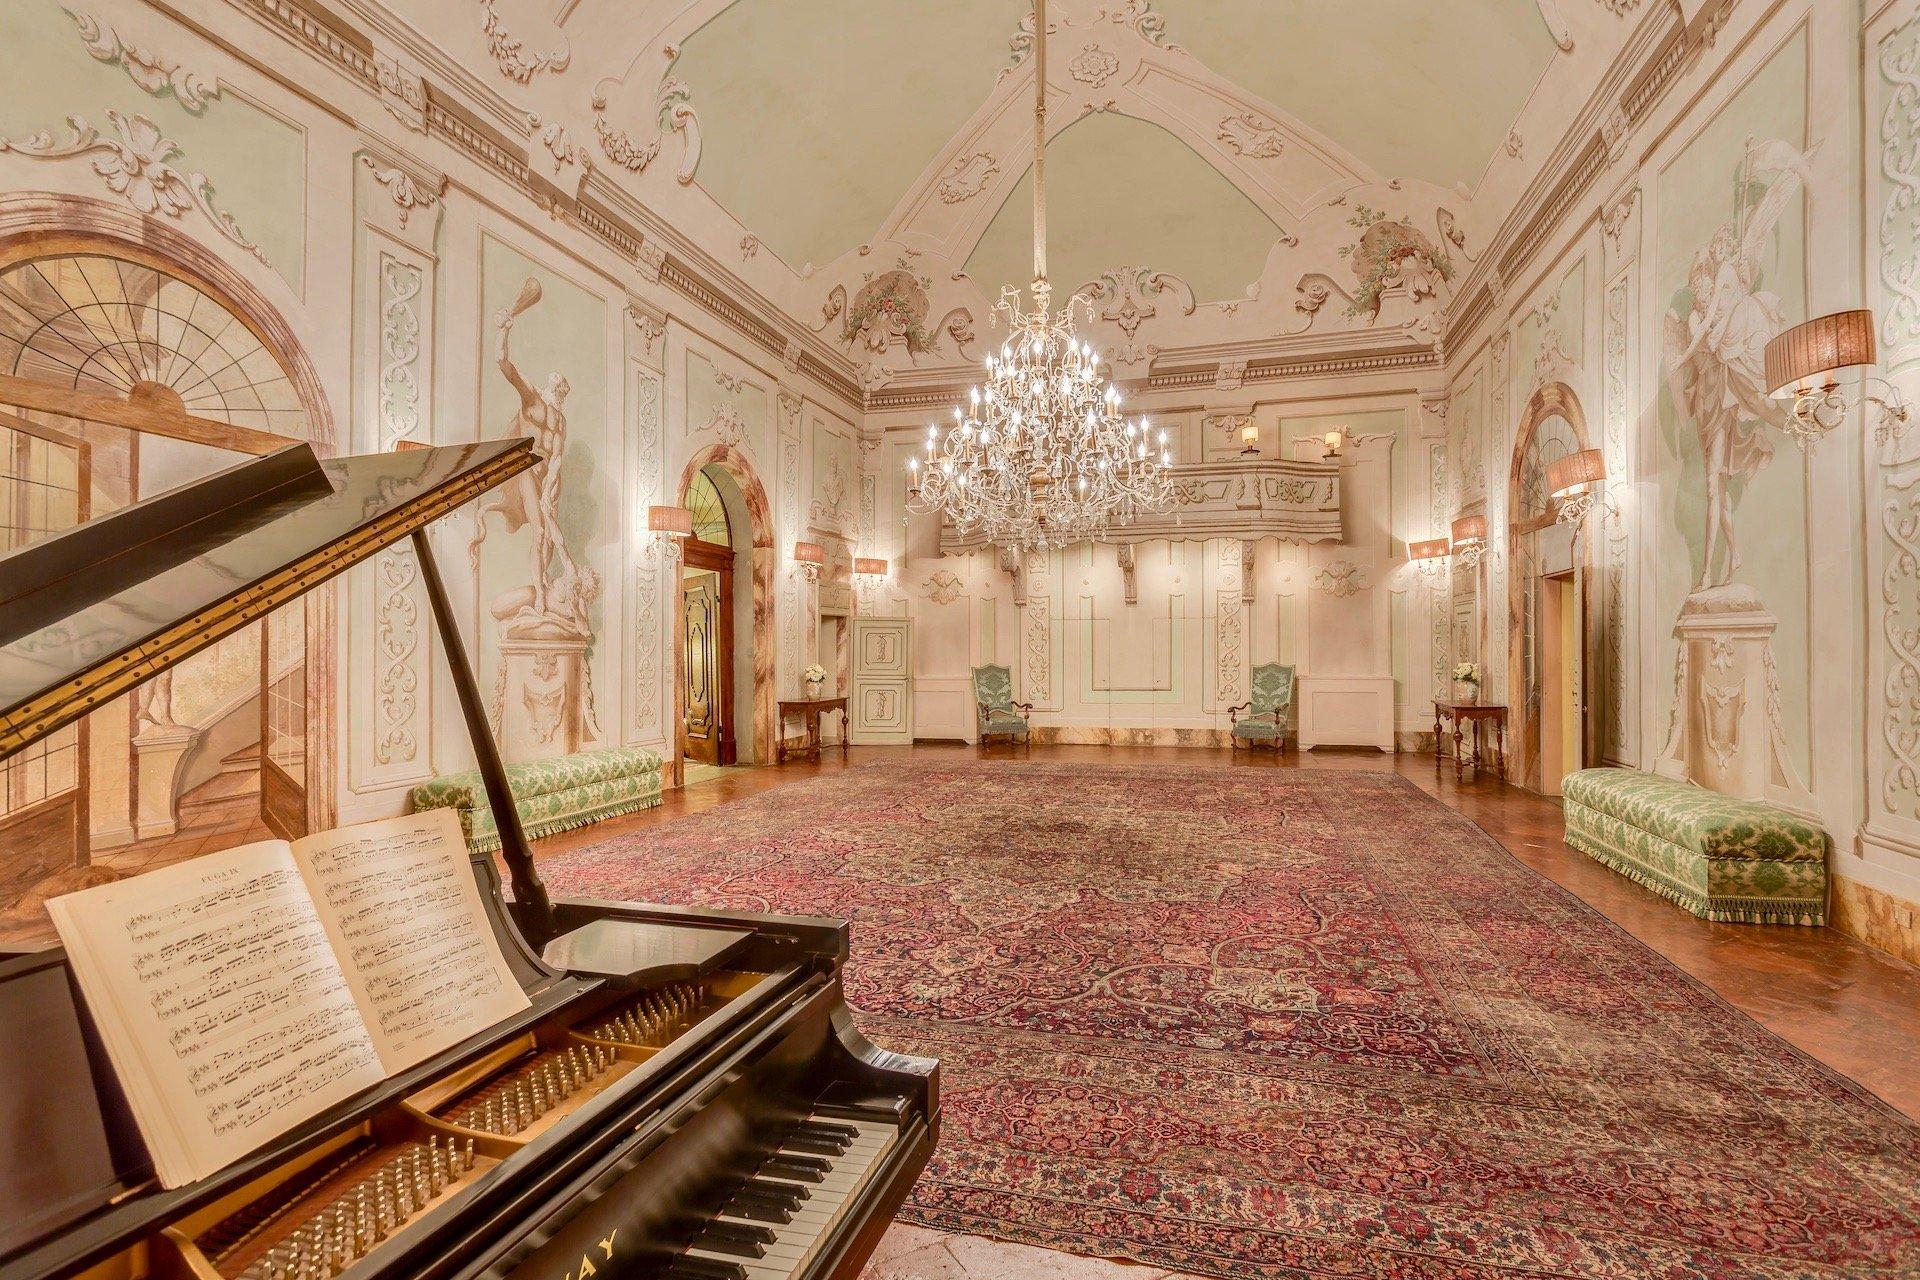 3.The Ballroom